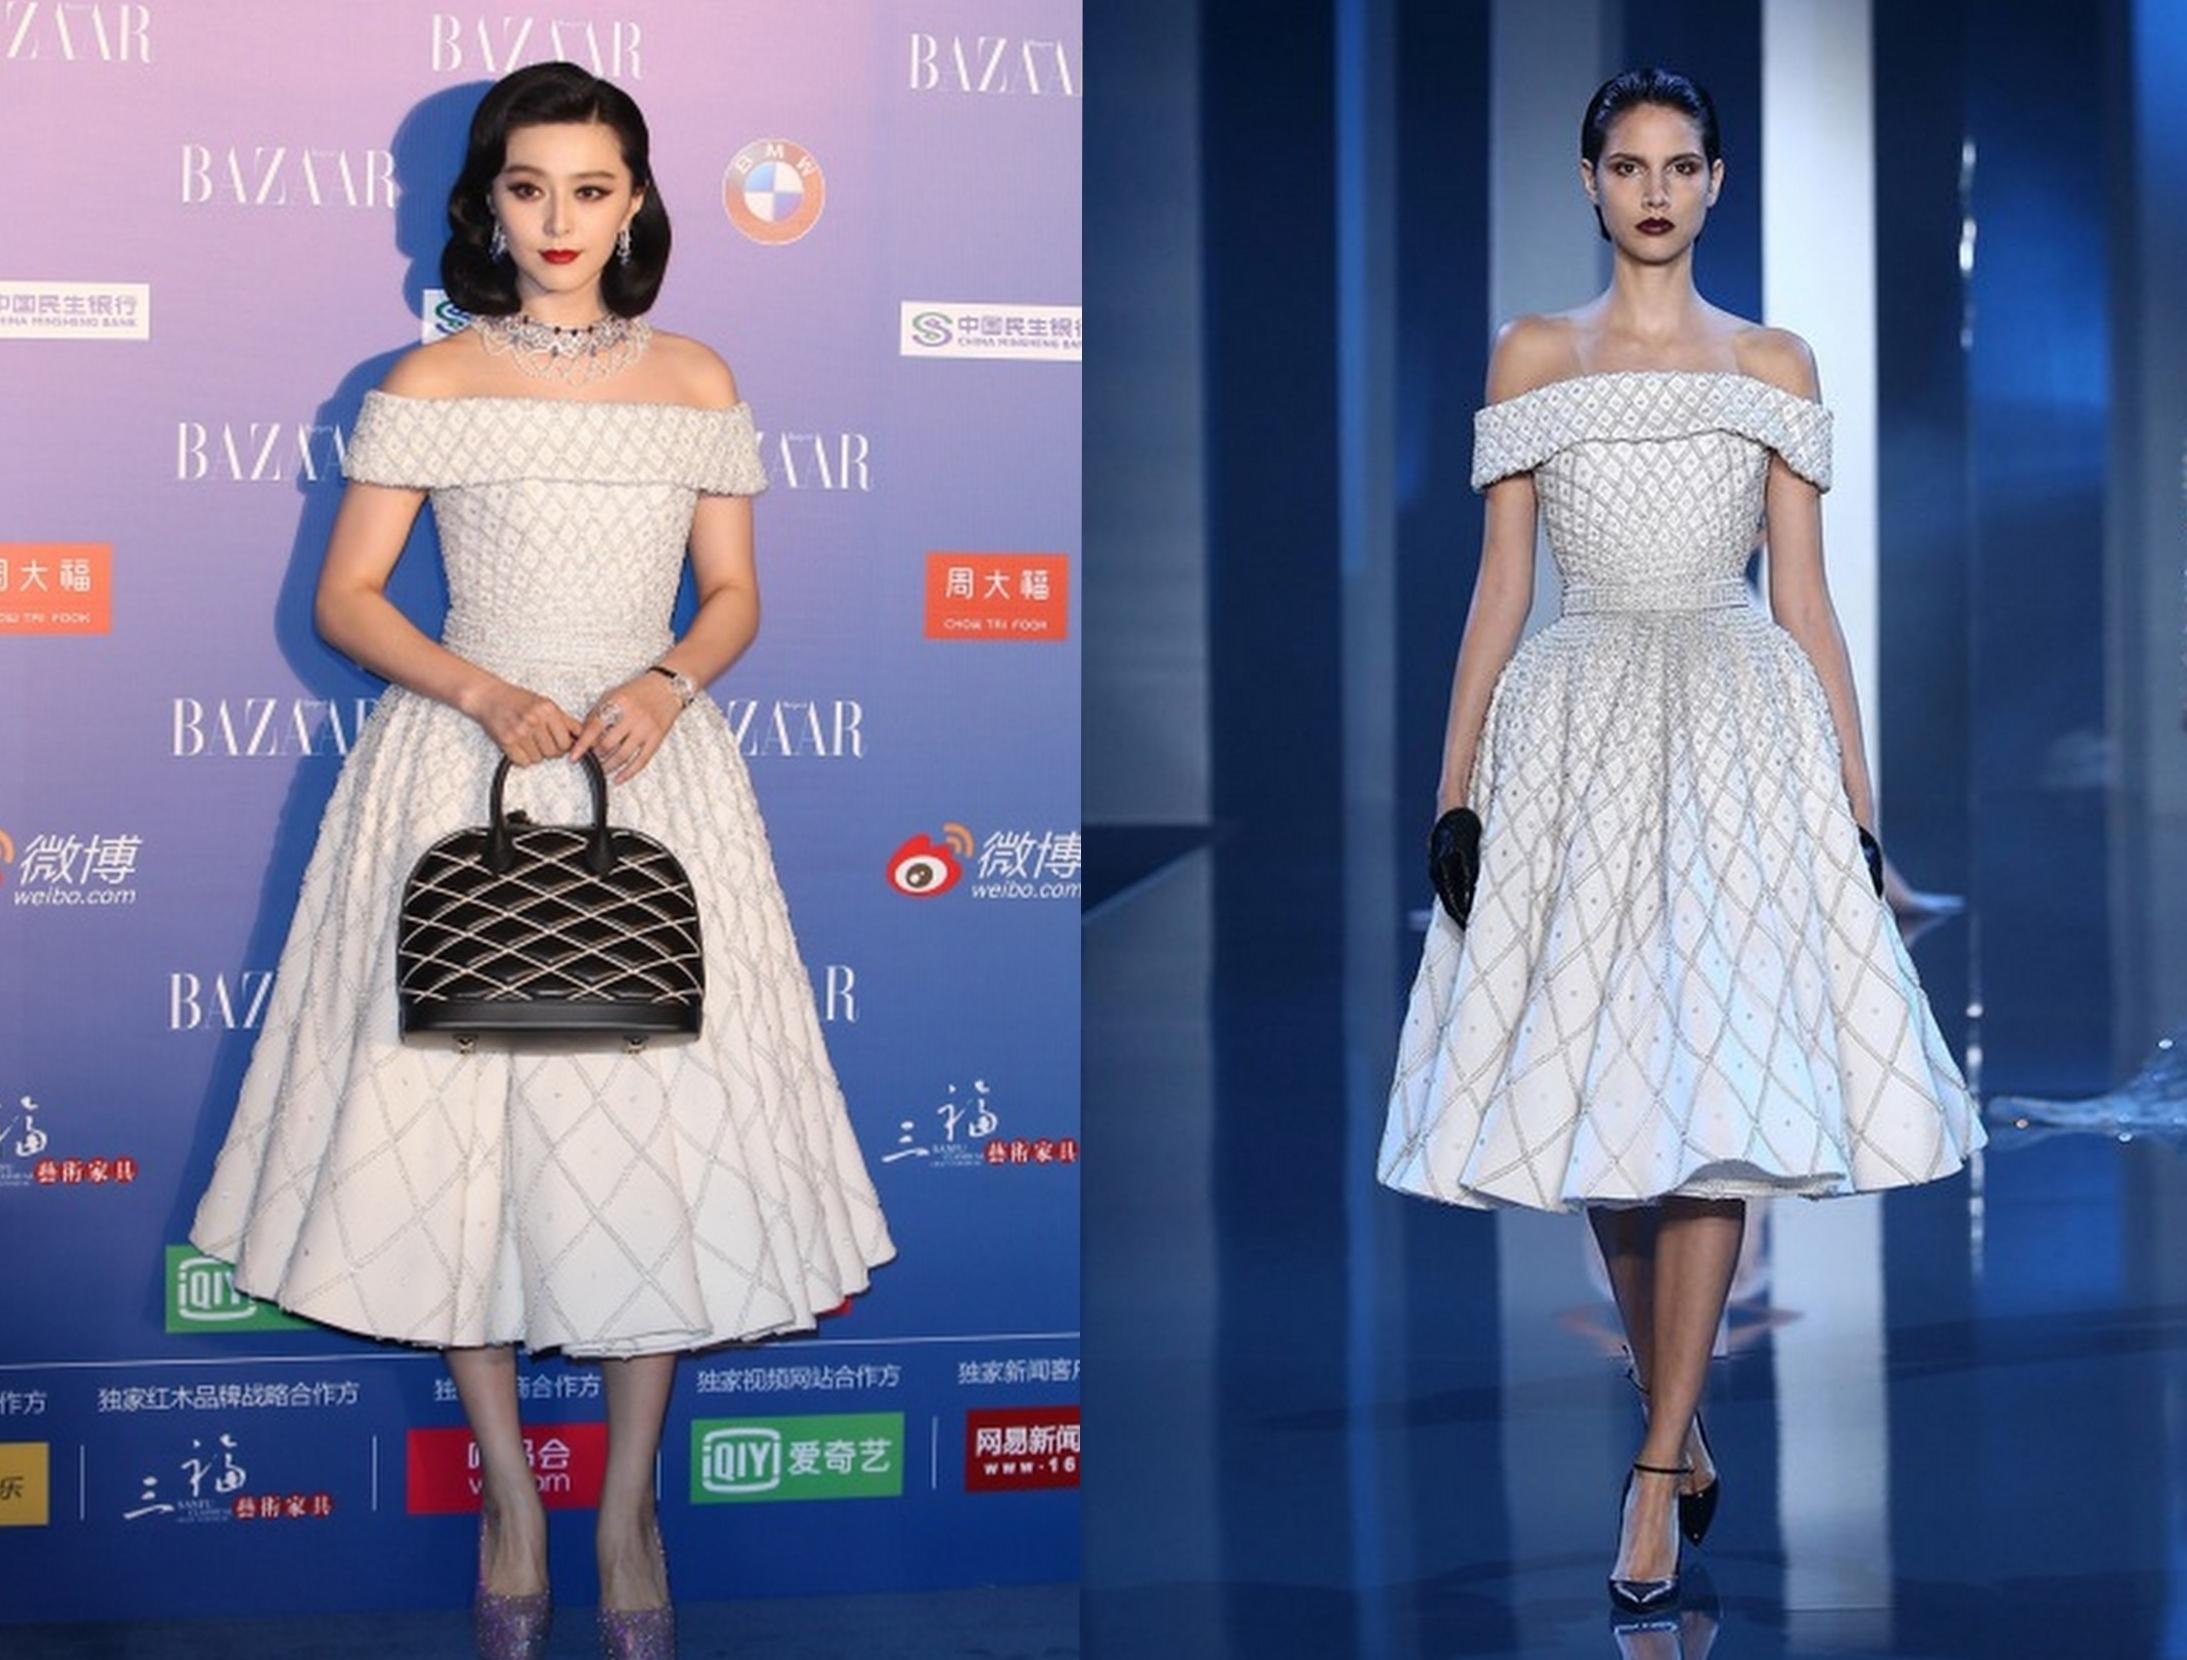 Fan-Bingbing-In-Ralph-Russo-Couture-2014-Bazaar-Charity-Night